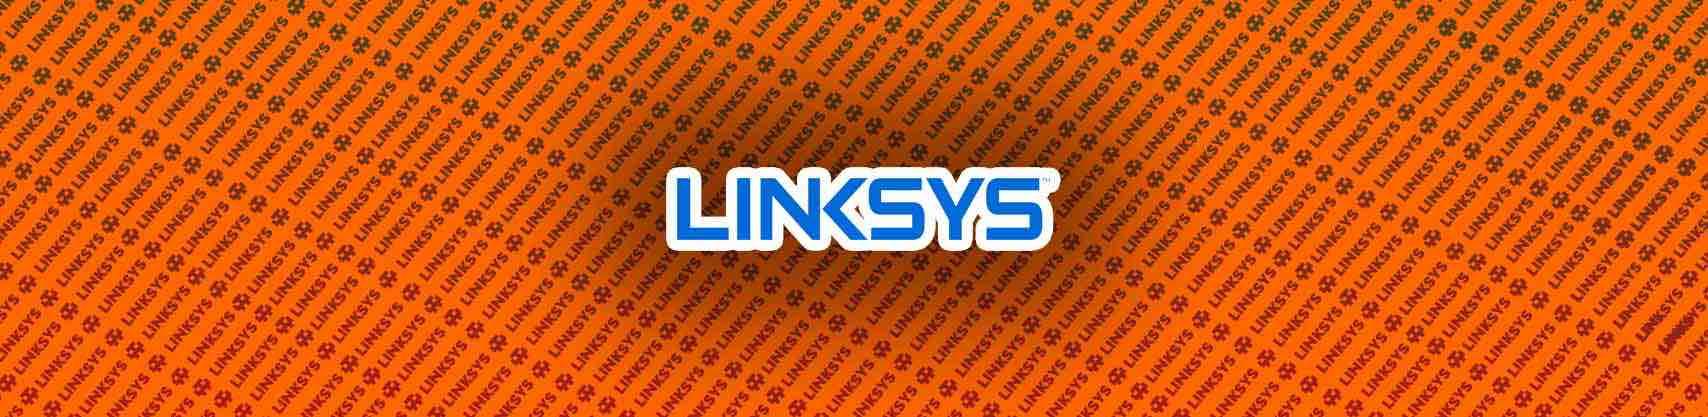 Linksys WRT3200ACM Manual